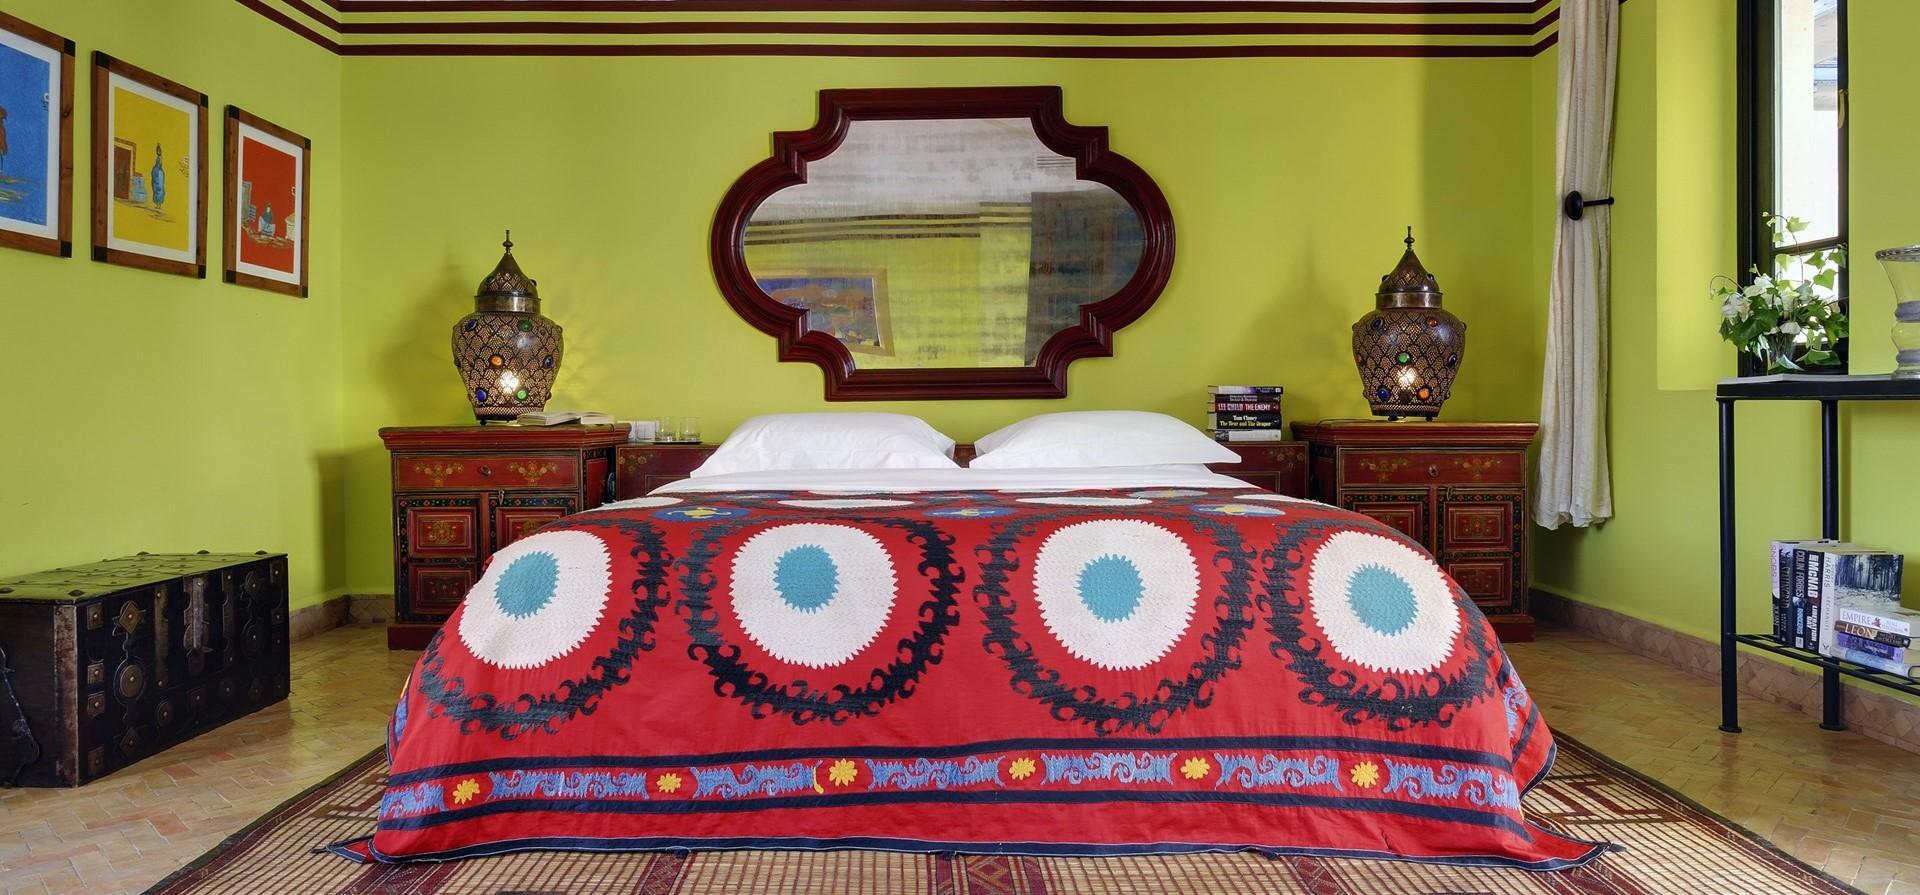 vella-ezzahra-master-suite-bedroom